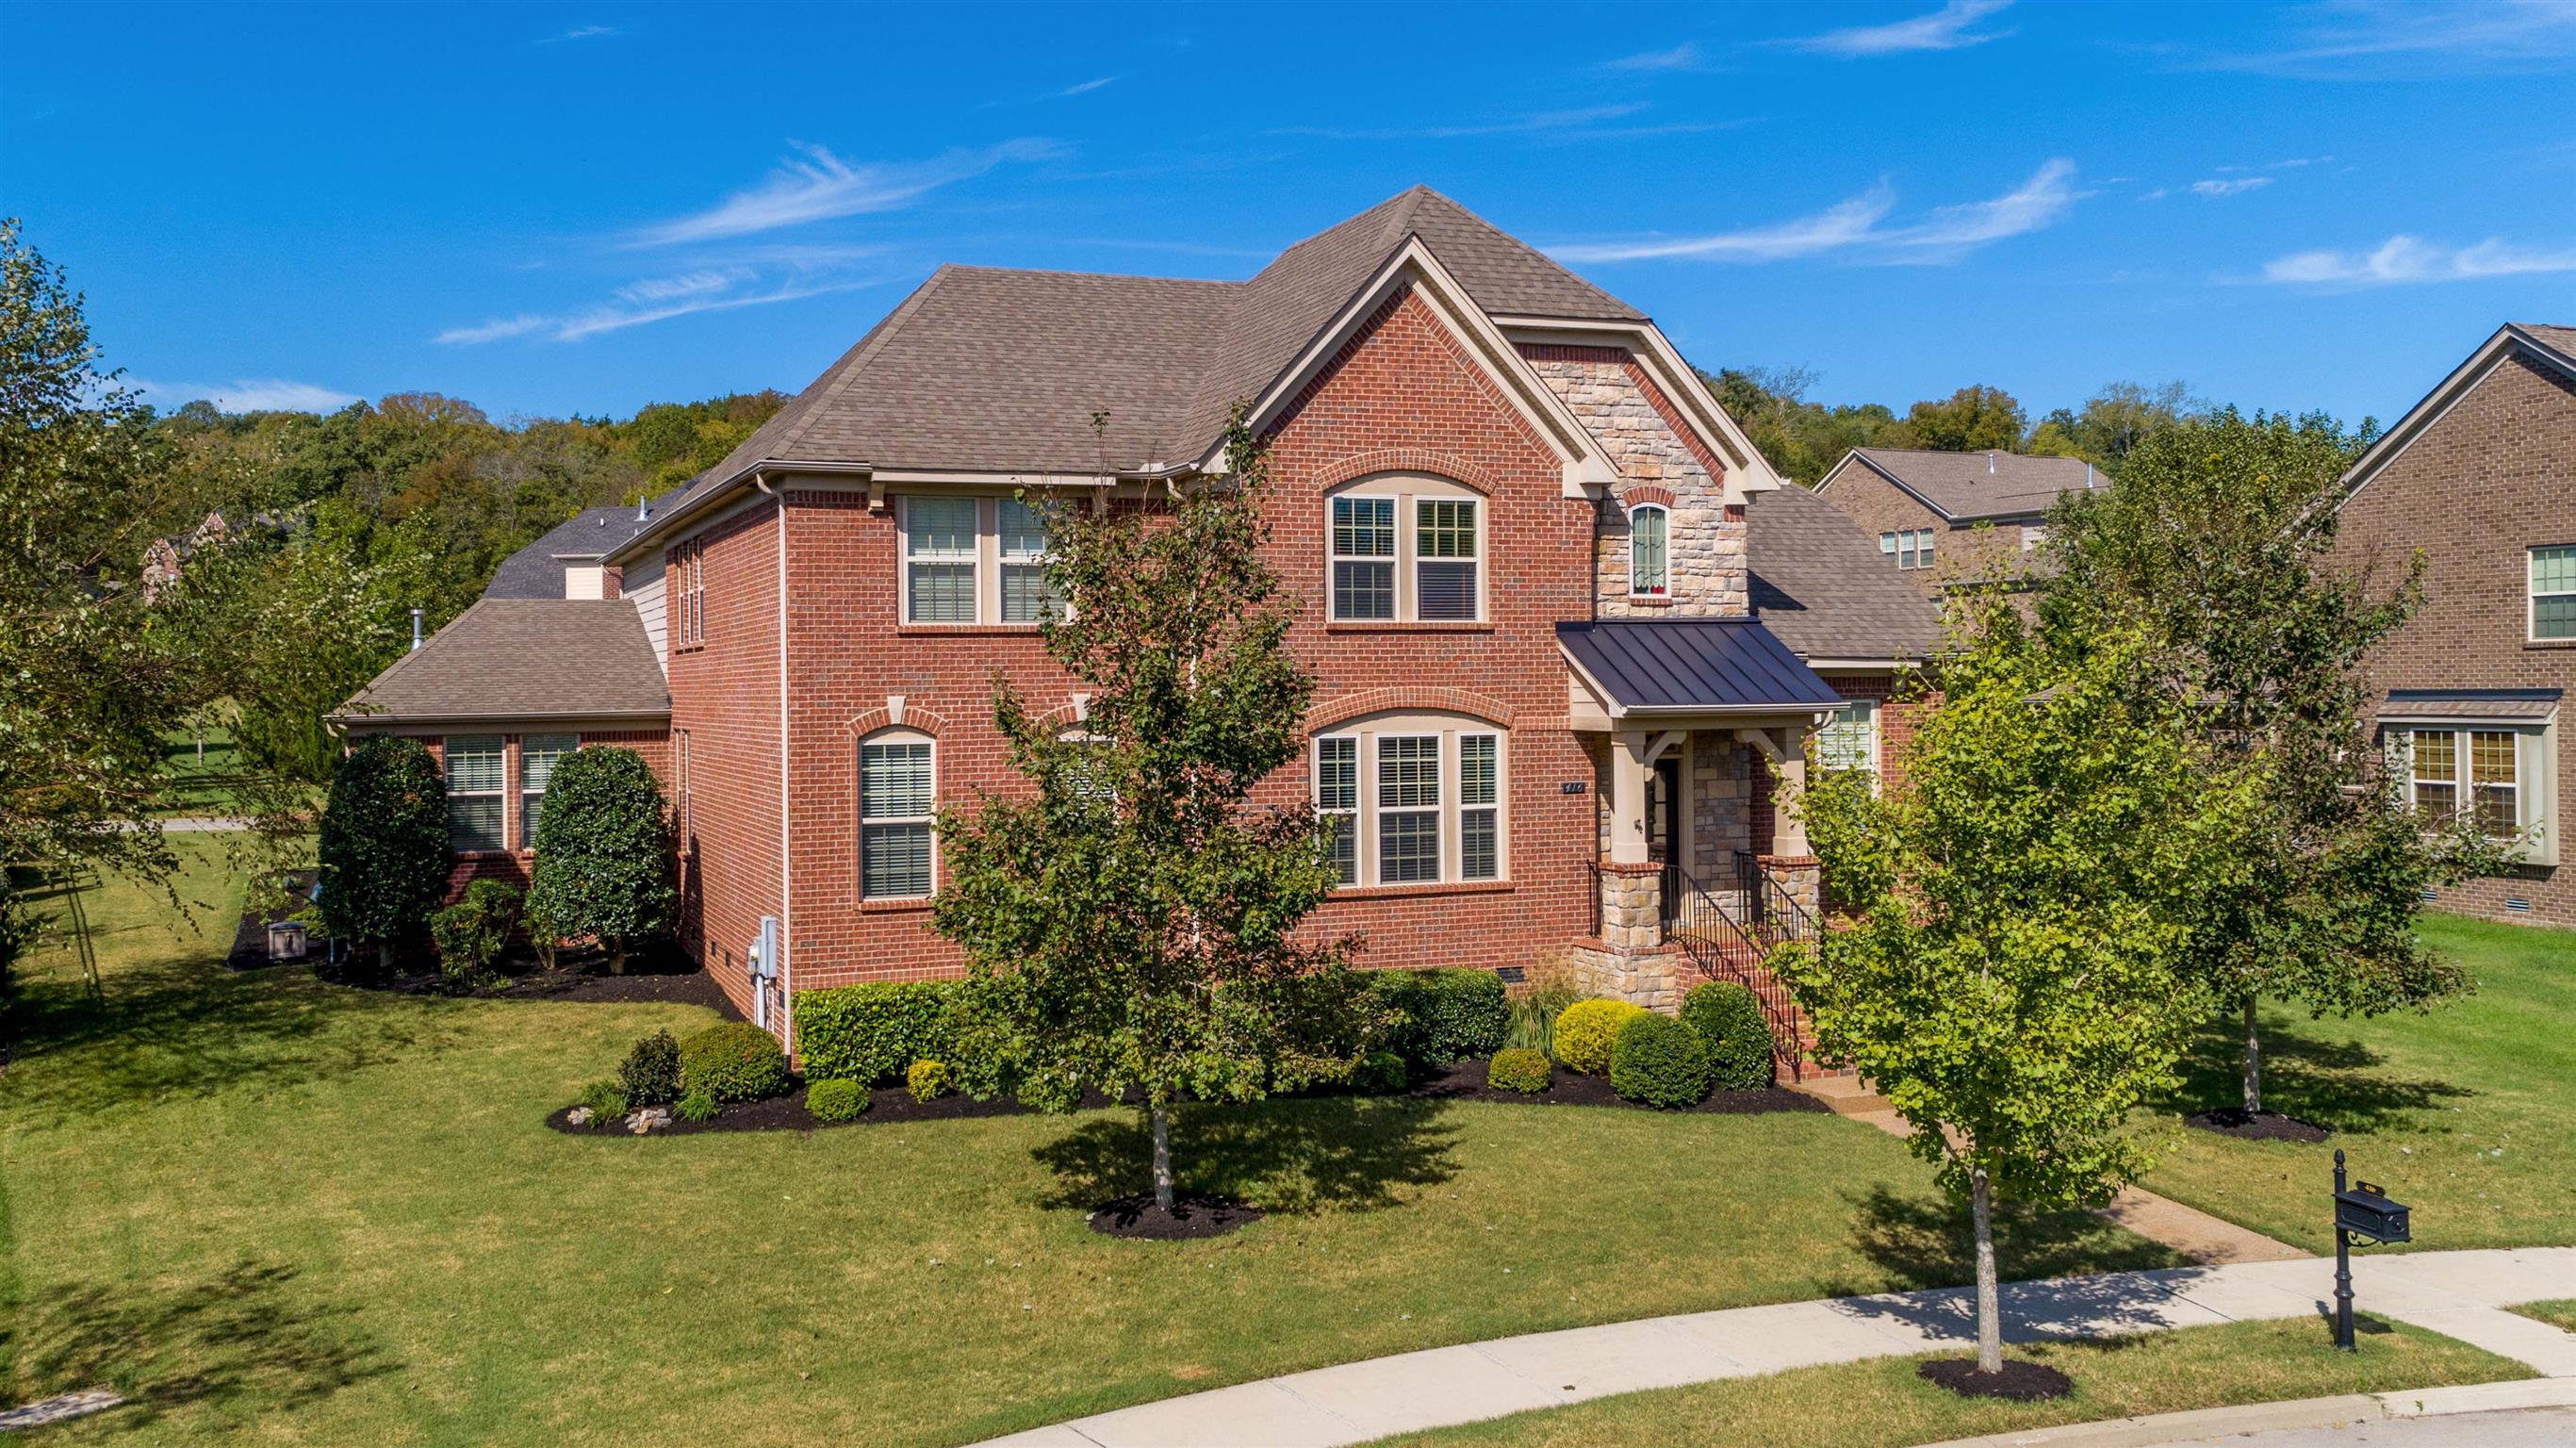 416 Gambrel St, Franklin, TN 37067 - Franklin, TN real estate listing